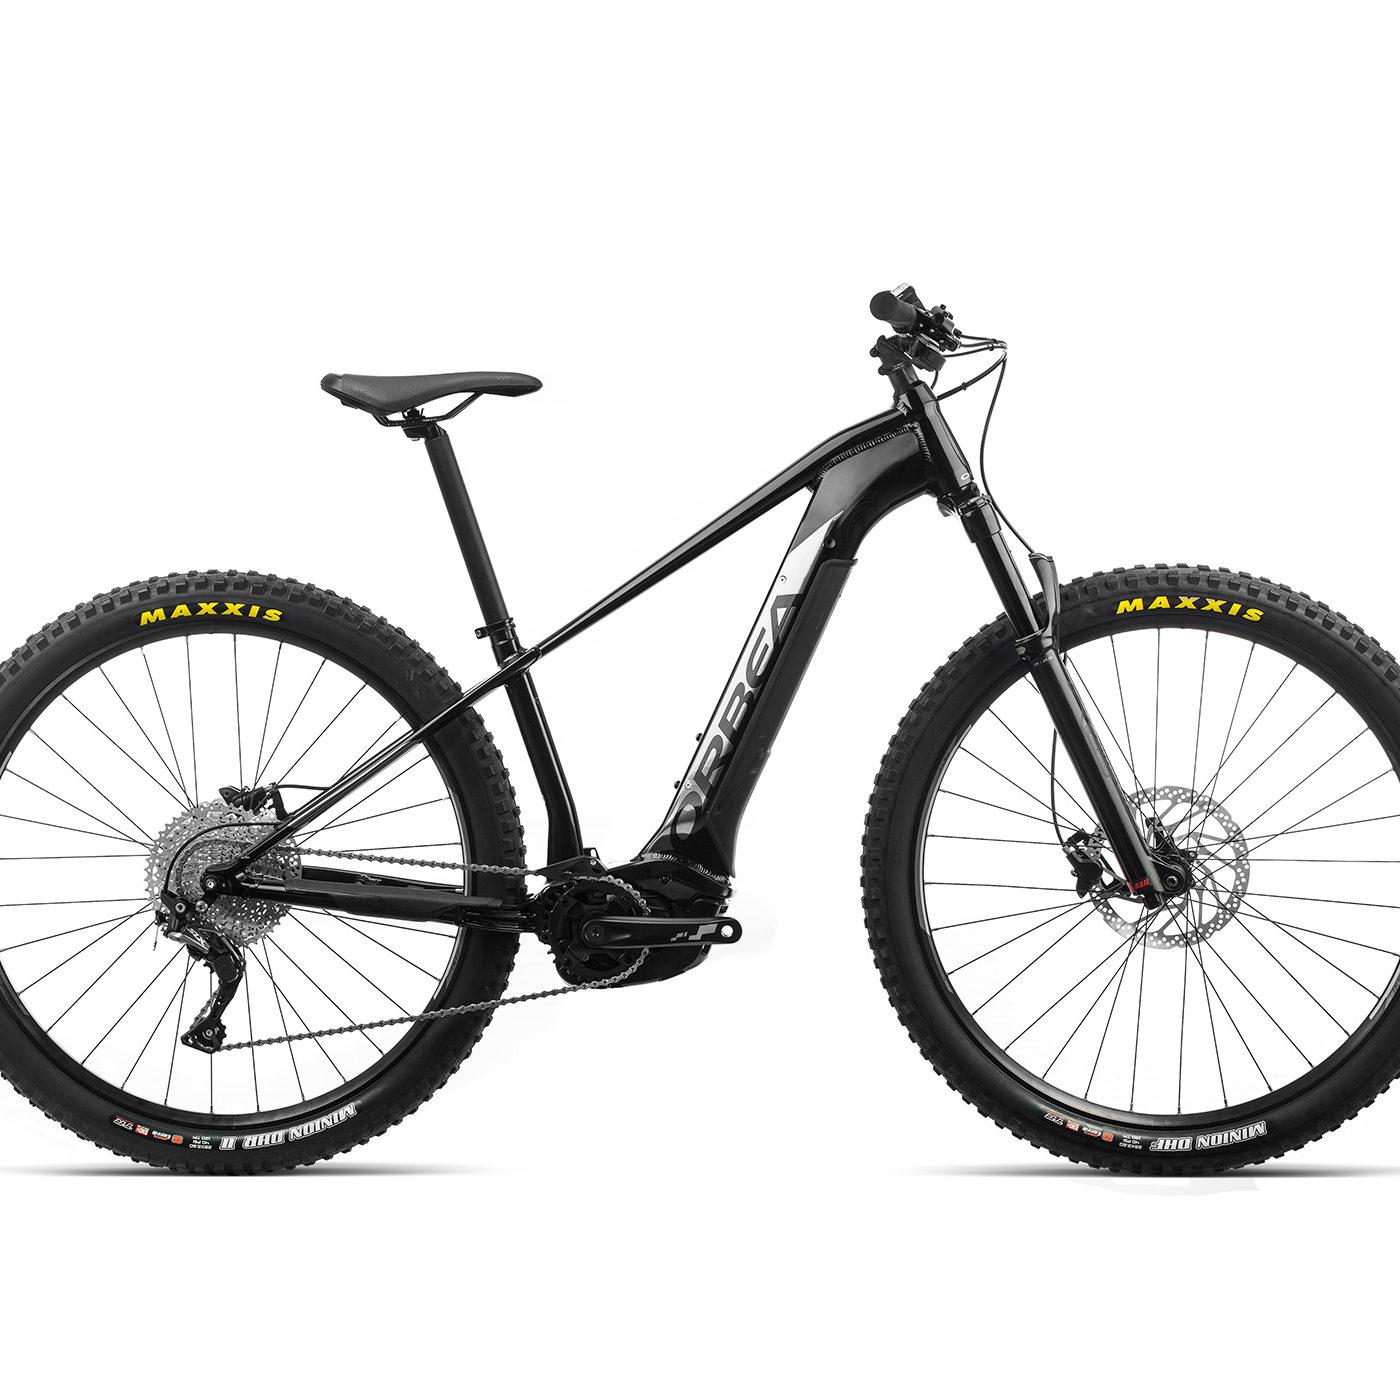 ORBEA WILD HT30 29 ebike - METALLIC ZWART / TITANIUM (GLOSS) @G-Bikes